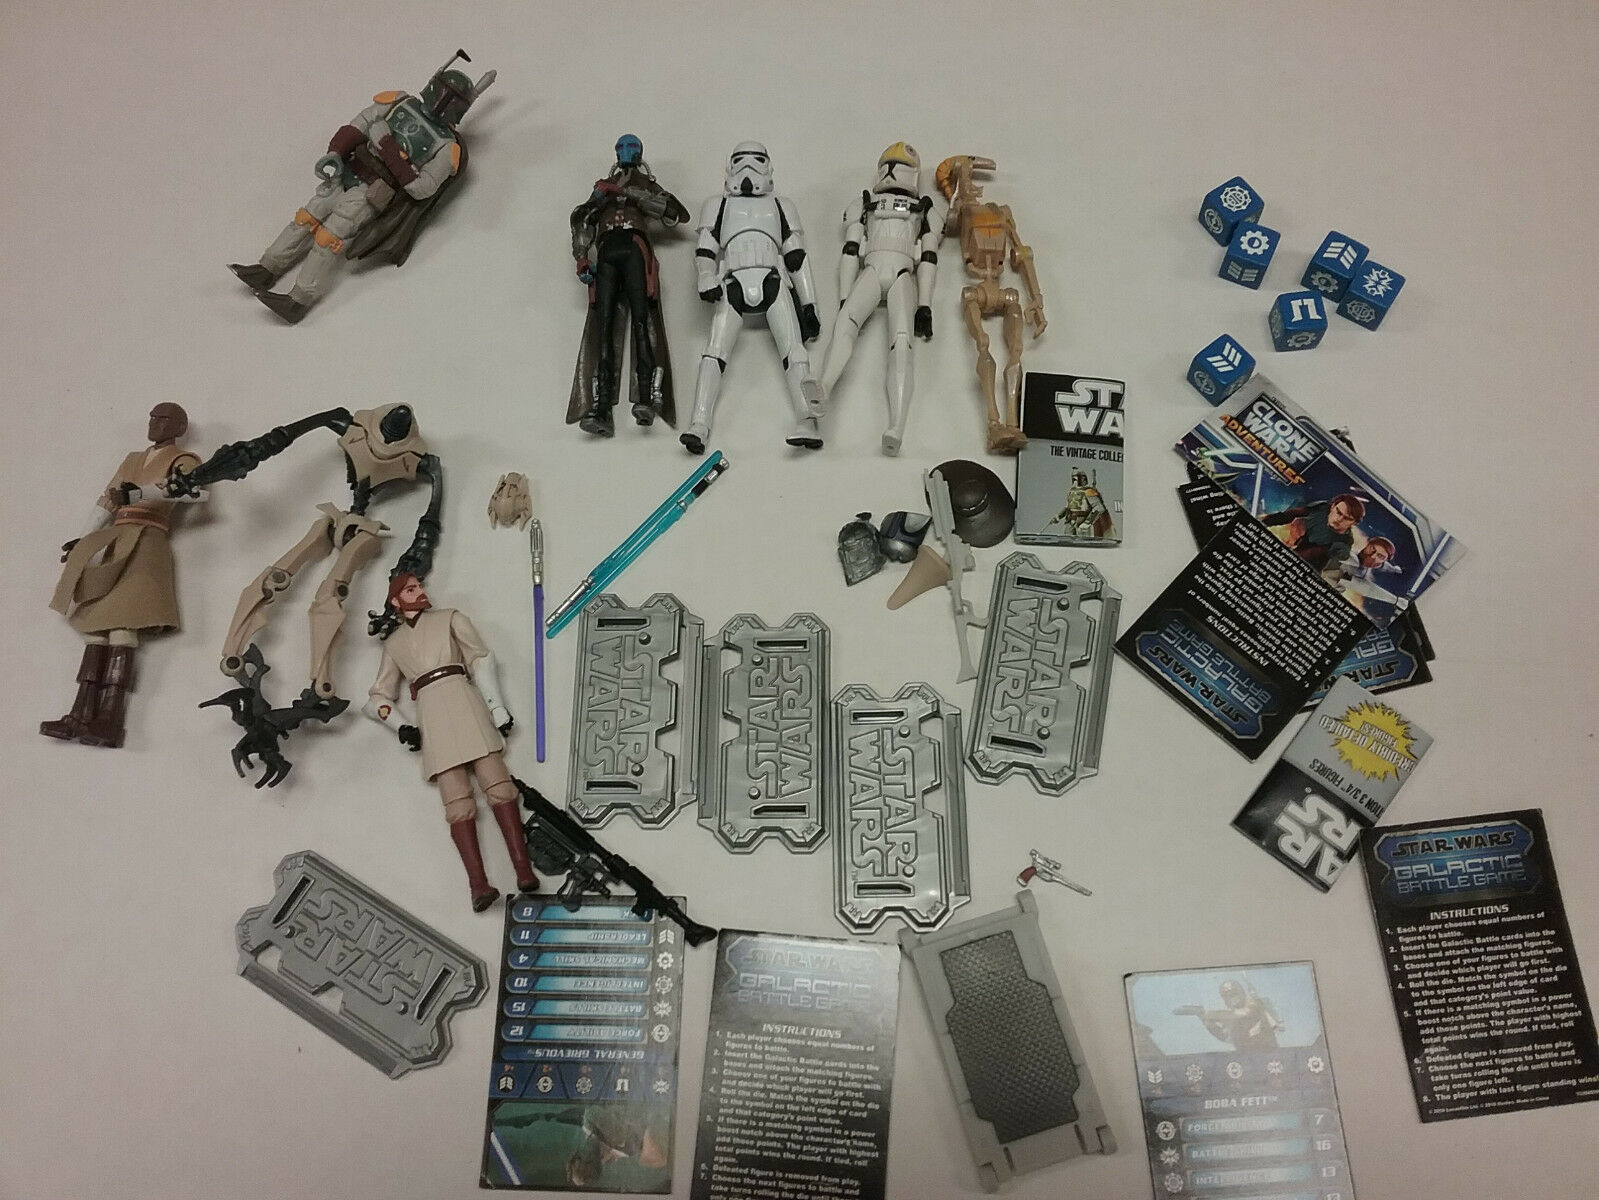 Star Wars Loose LOT LOT LOT 11 Figures Galactic Battlegame Clone Fett Obi Mace Grevious 5f3feb